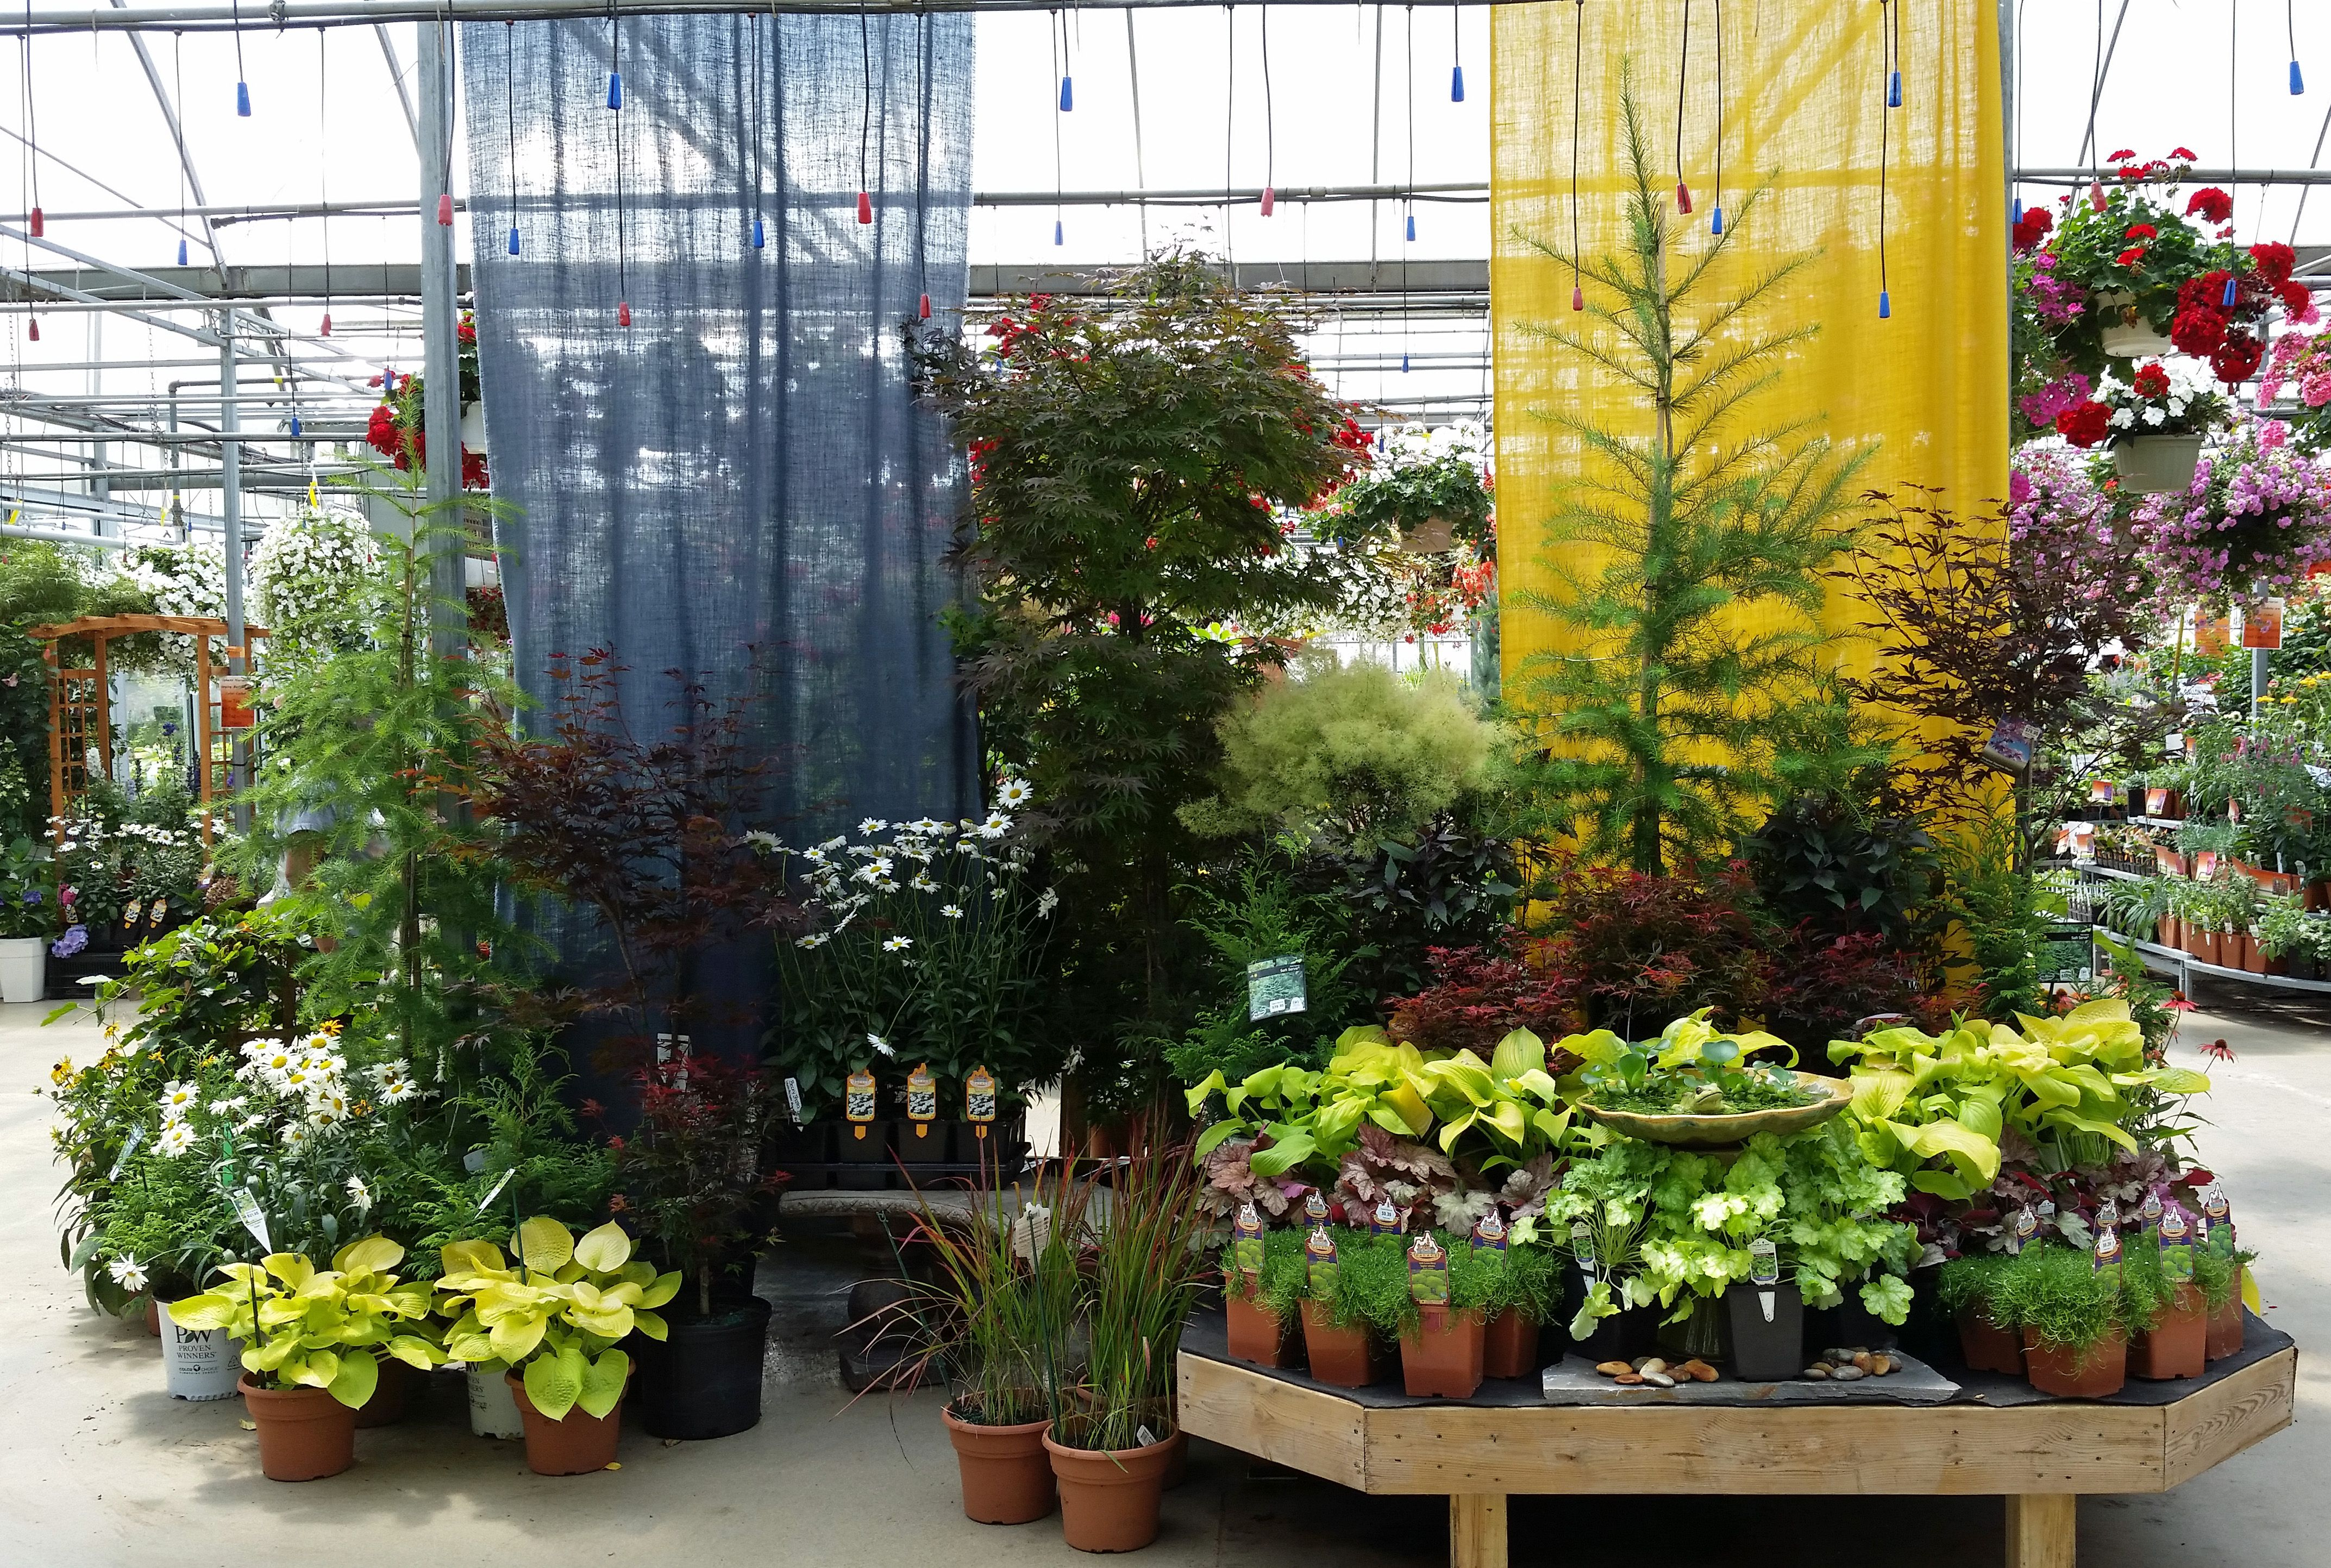 Award Winning Perennial Display Sipkens Nurseries Garden Images